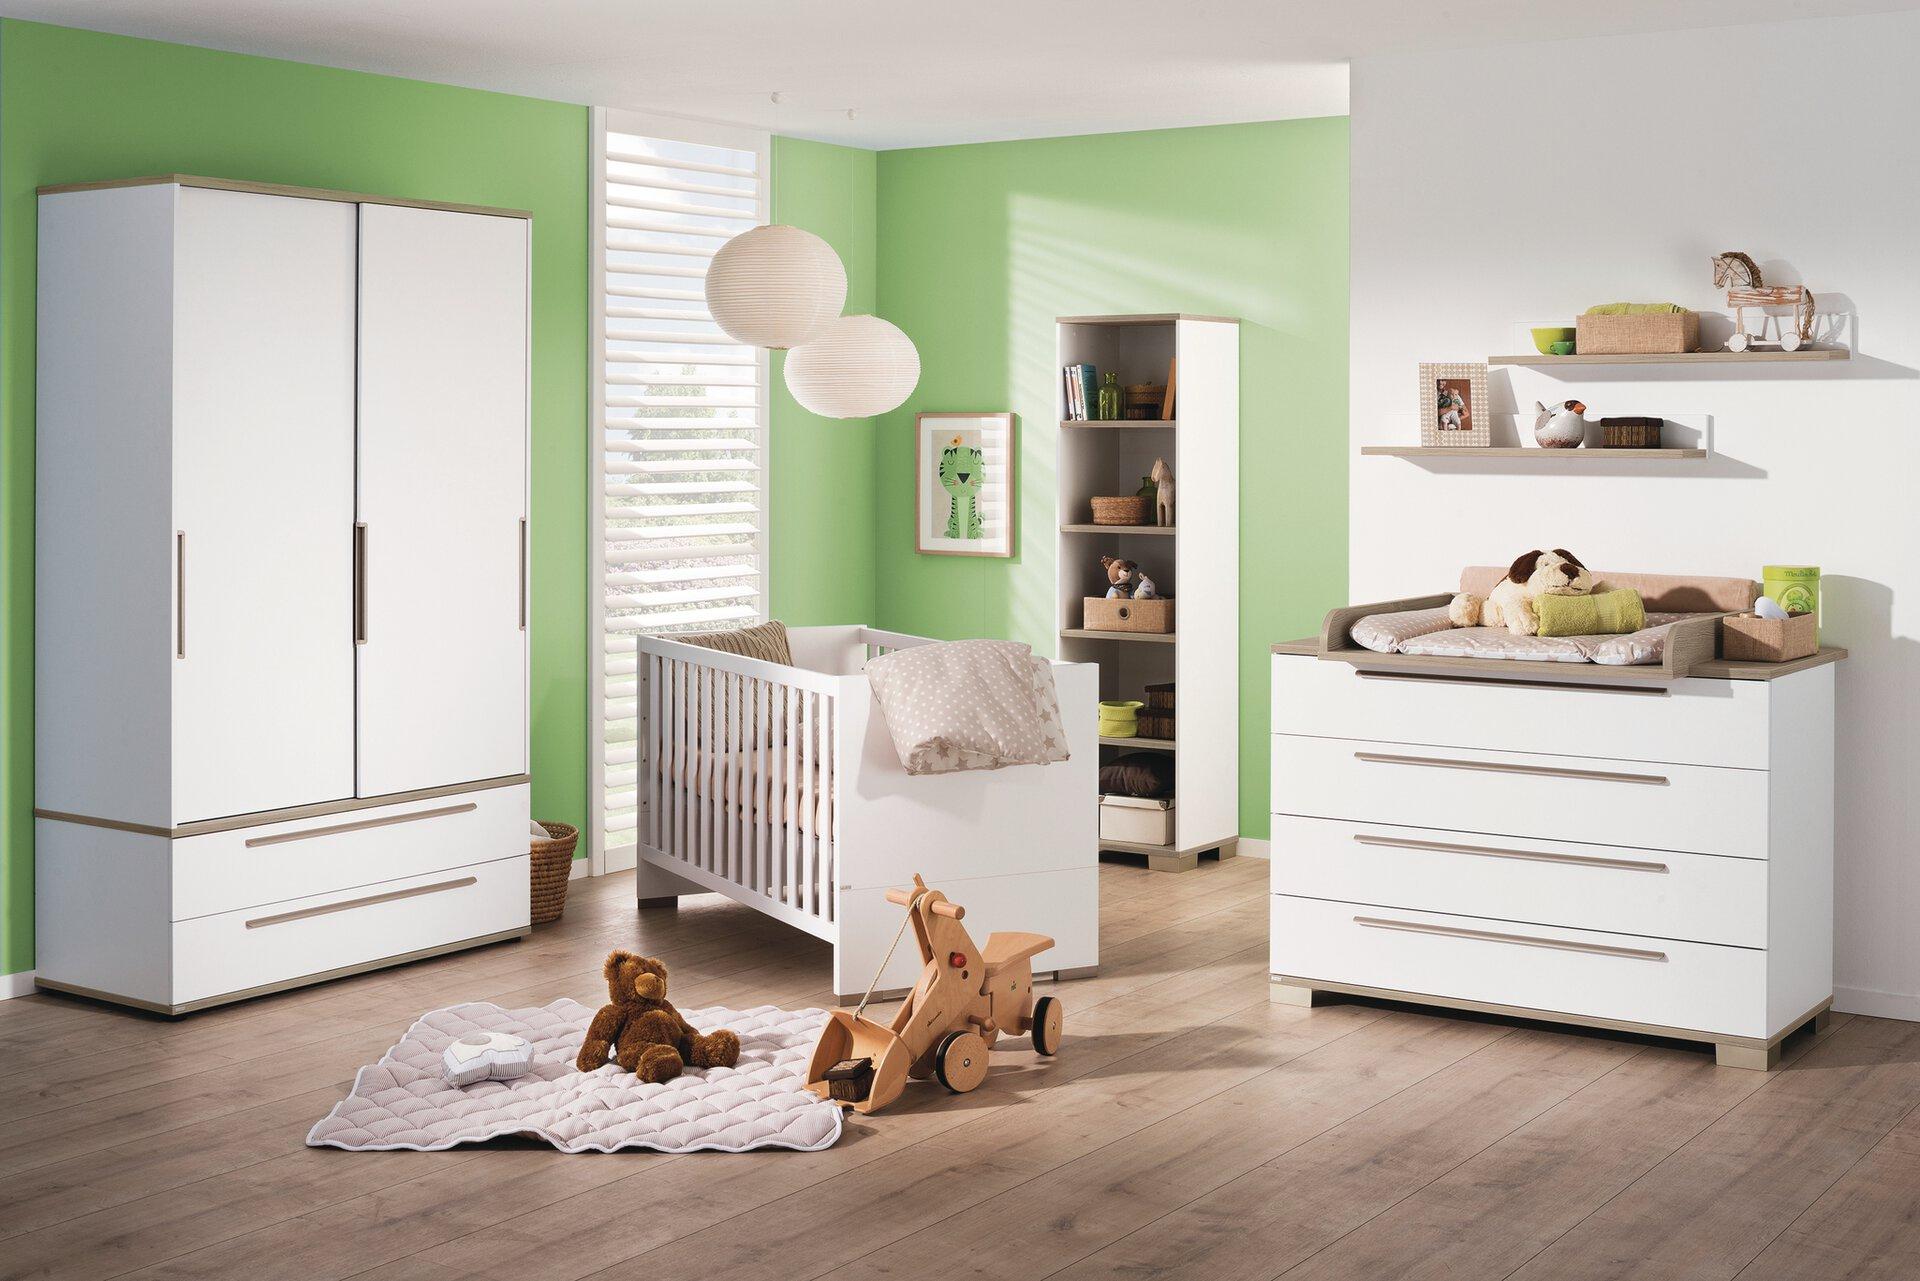 Babyzimmer CARLO PAIDI Holzwerkstoff 145 x 83 x 76 cm